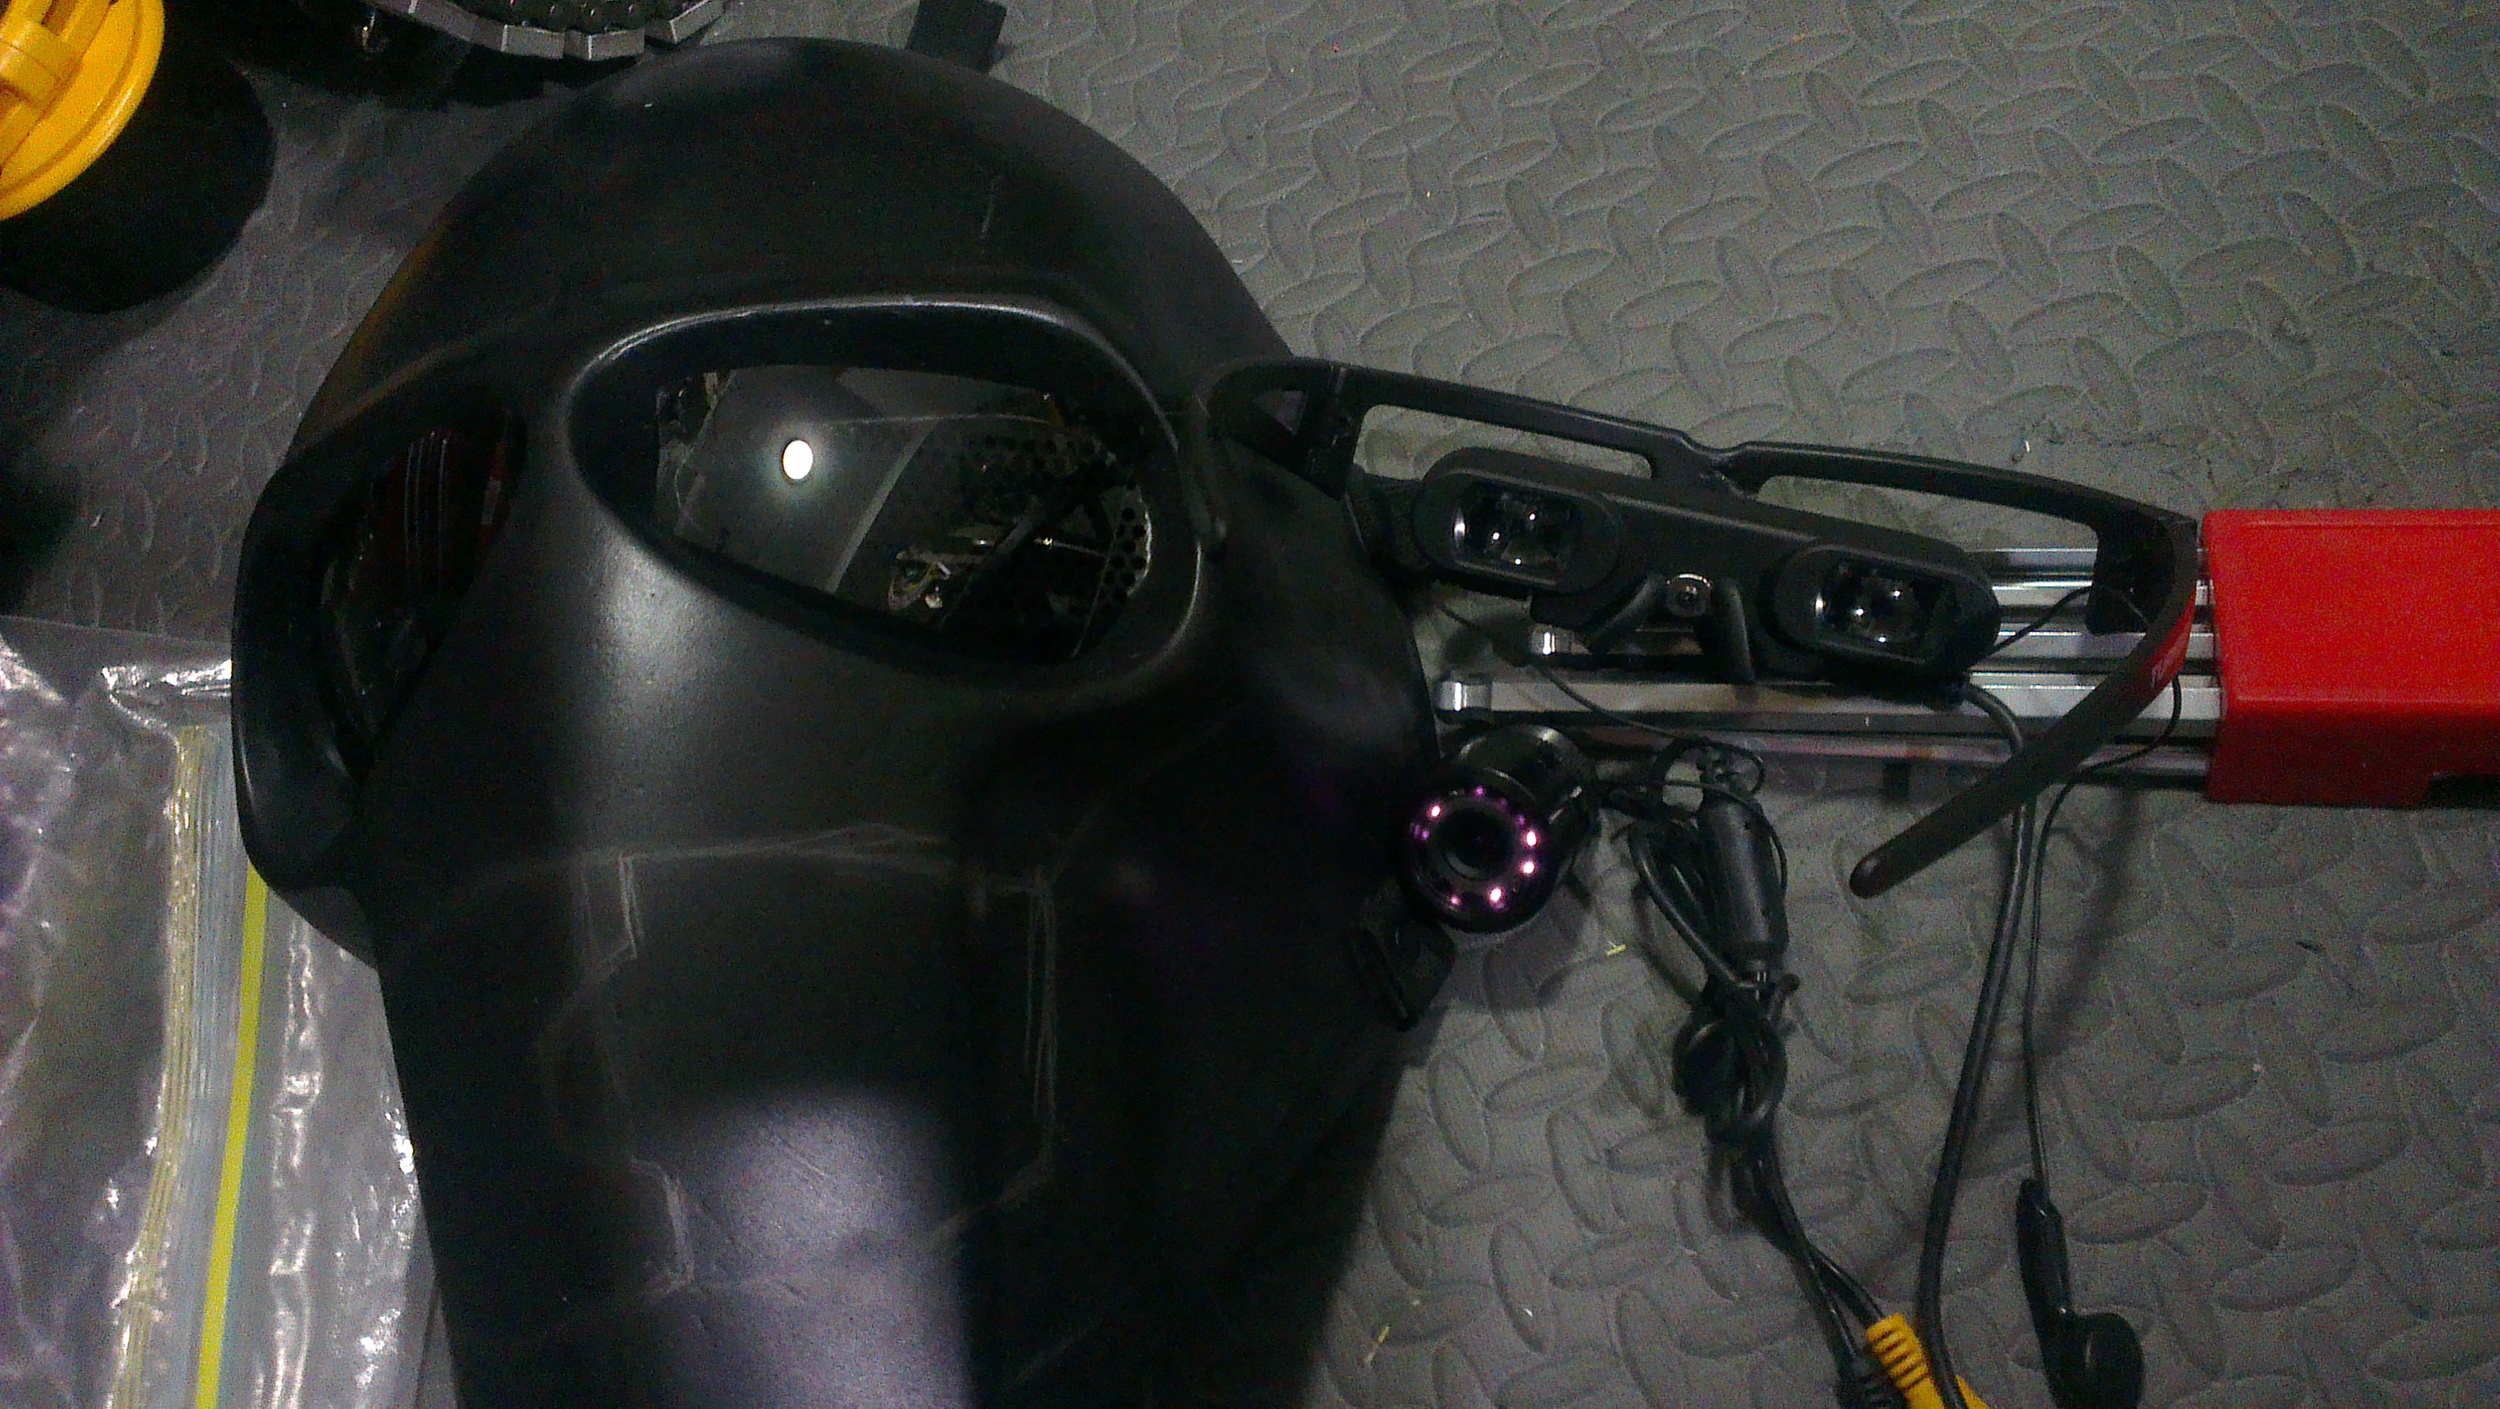 Back camera display on glasses display inside face plate.